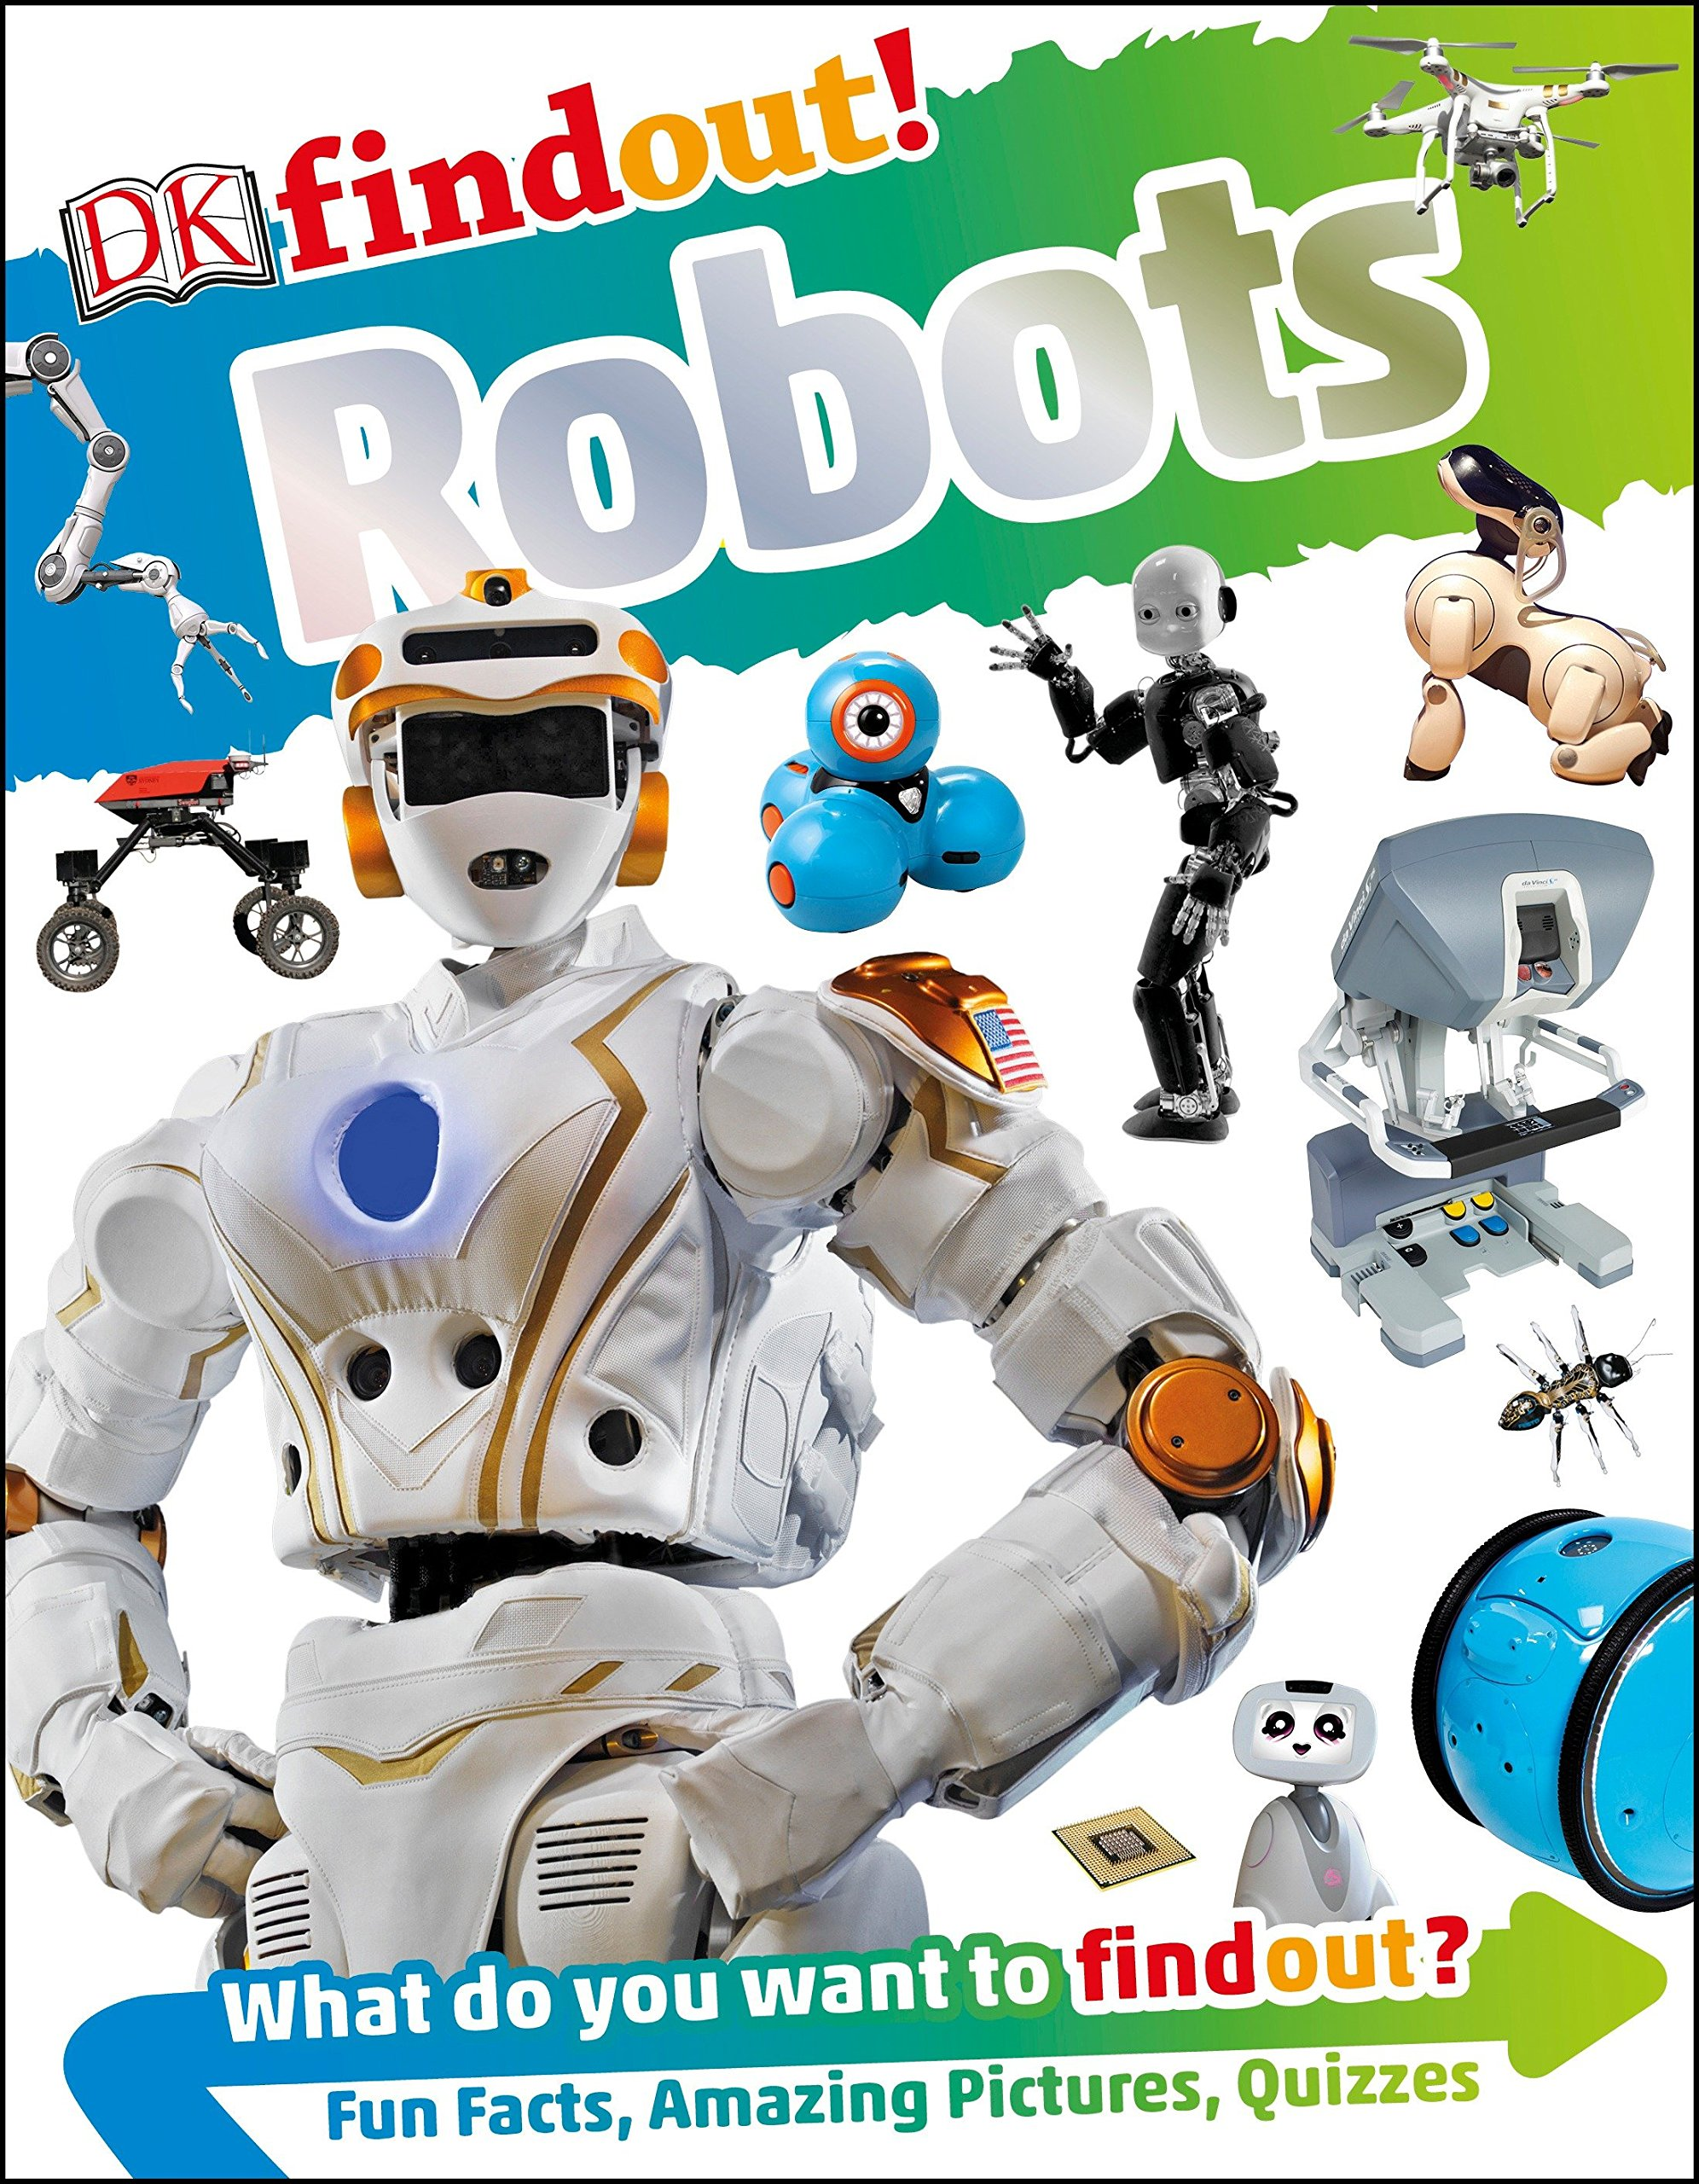 DKfindout! Robots: Nathan Lepora: 9781465469335: Amazon com